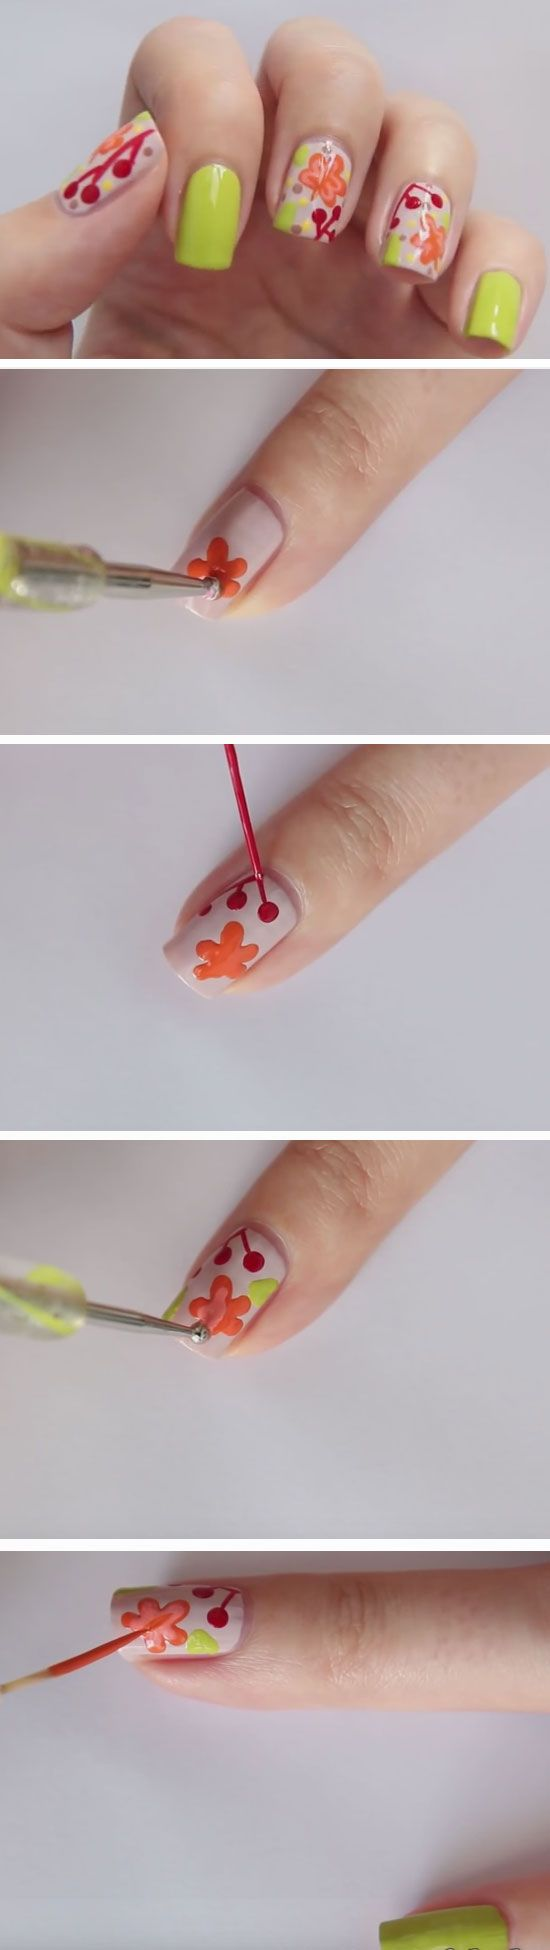 22 Easy Fall Nail Designs For Short Nails Pinterest Thanksgiving